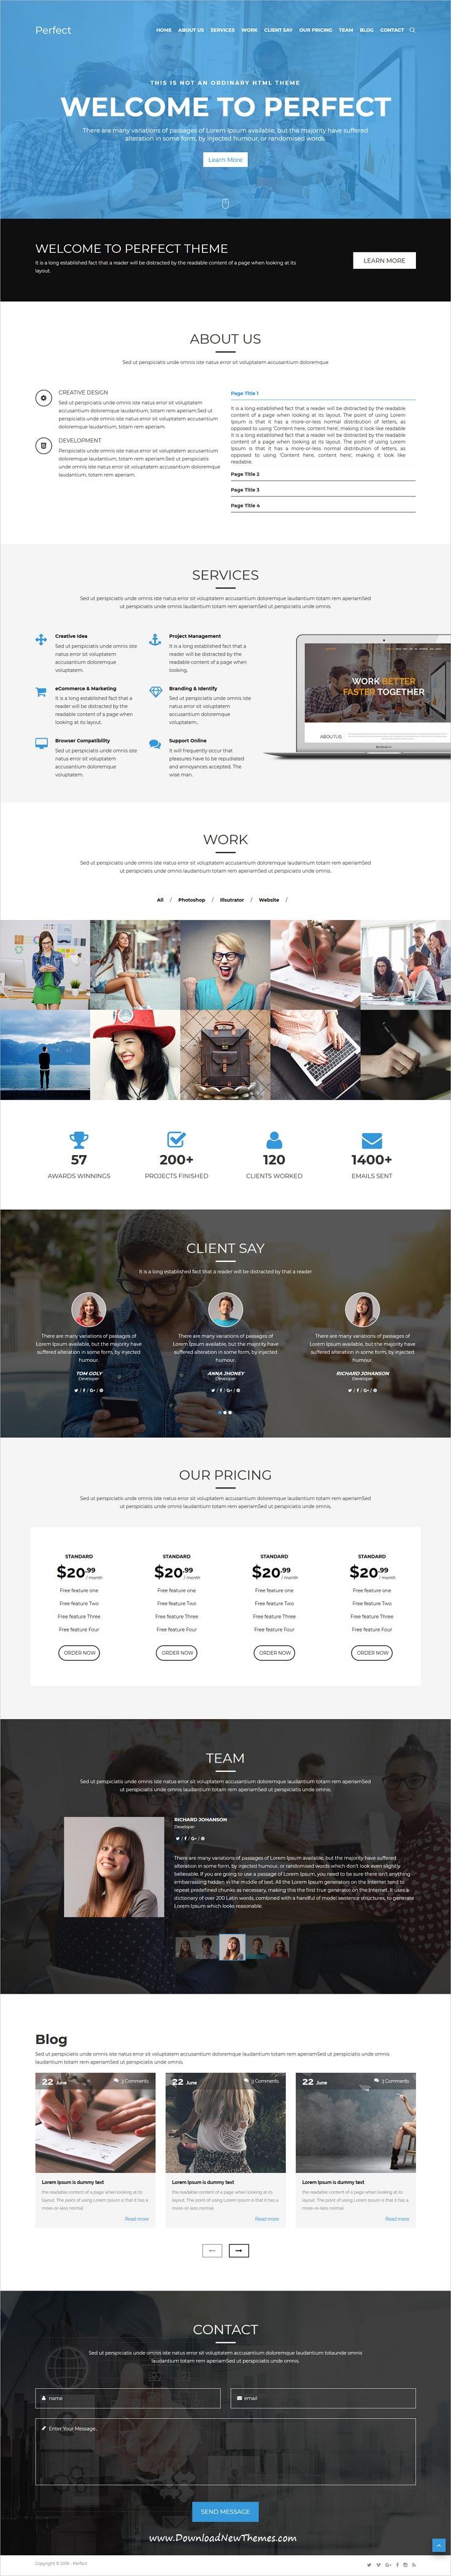 Perfect - Creative Multipurpose HTML5 Template | Business website ...